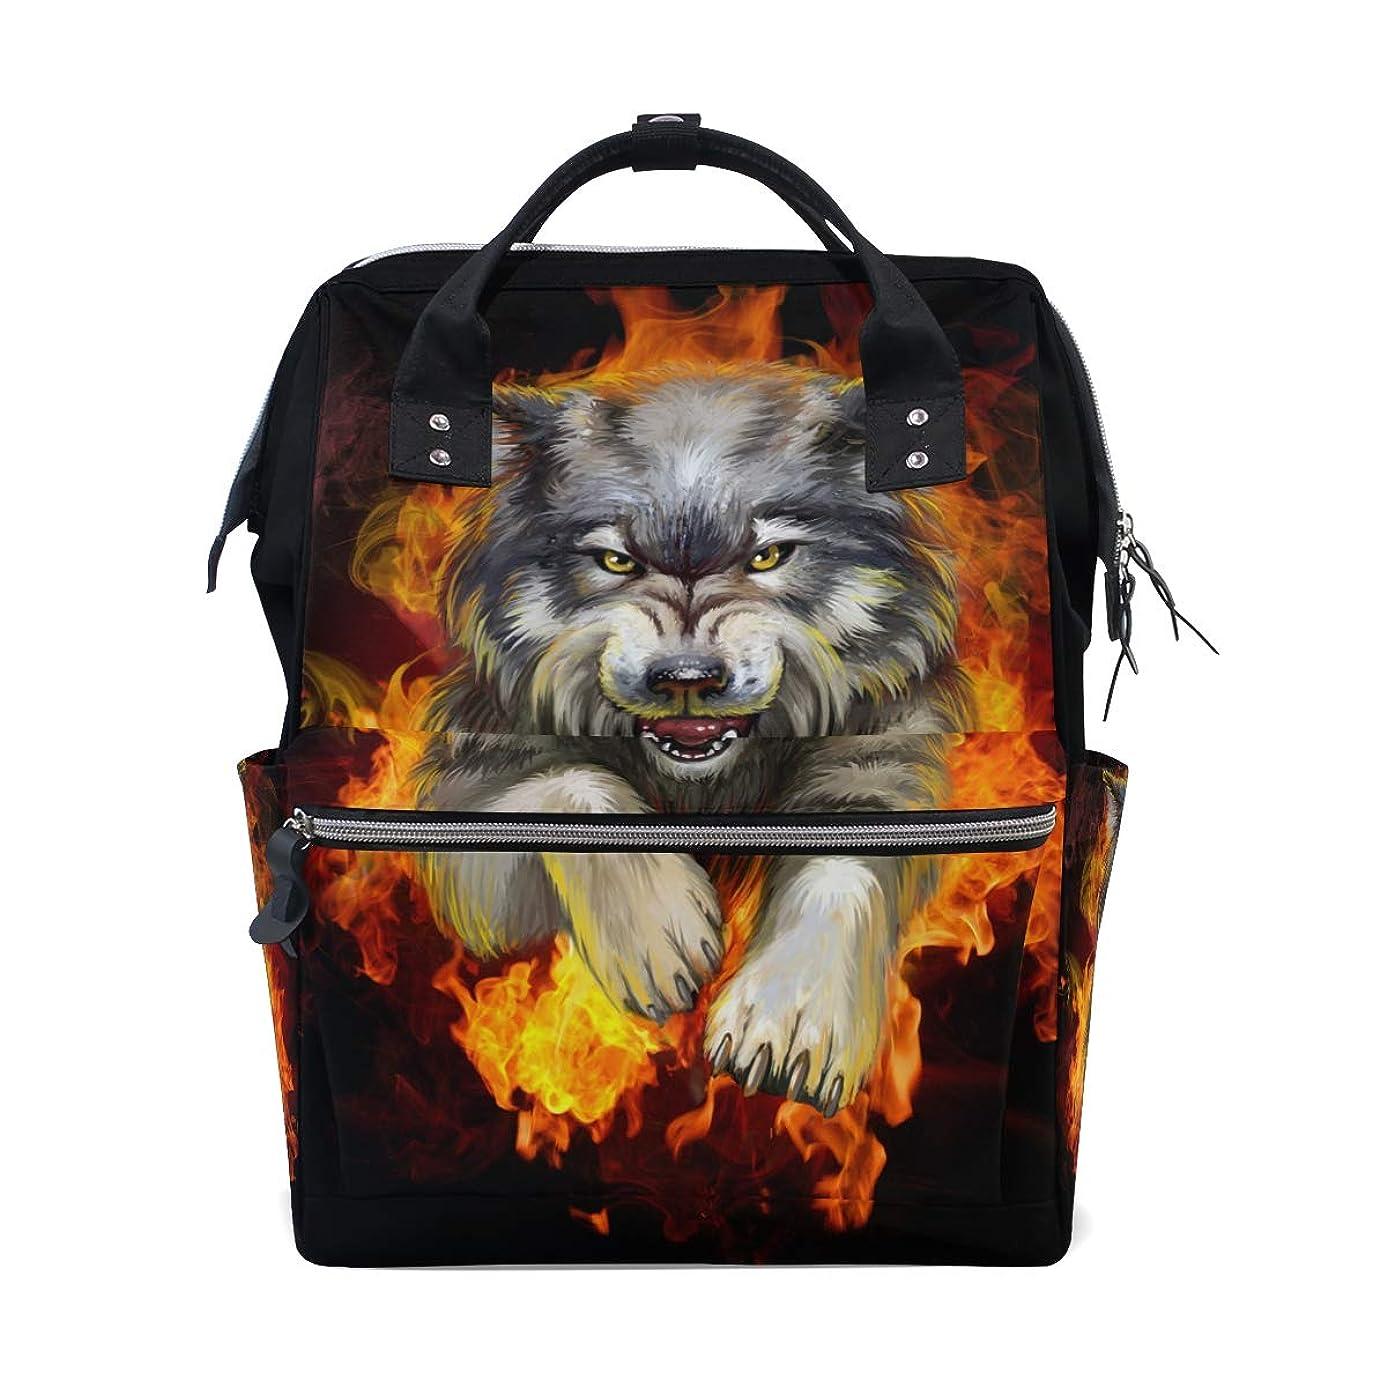 Anger Wolf Fire School Backpack Large Capacity Mummy Bags Laptop Handbag Casual Travel Rucksack Satchel For Women Men Adult Teen Children